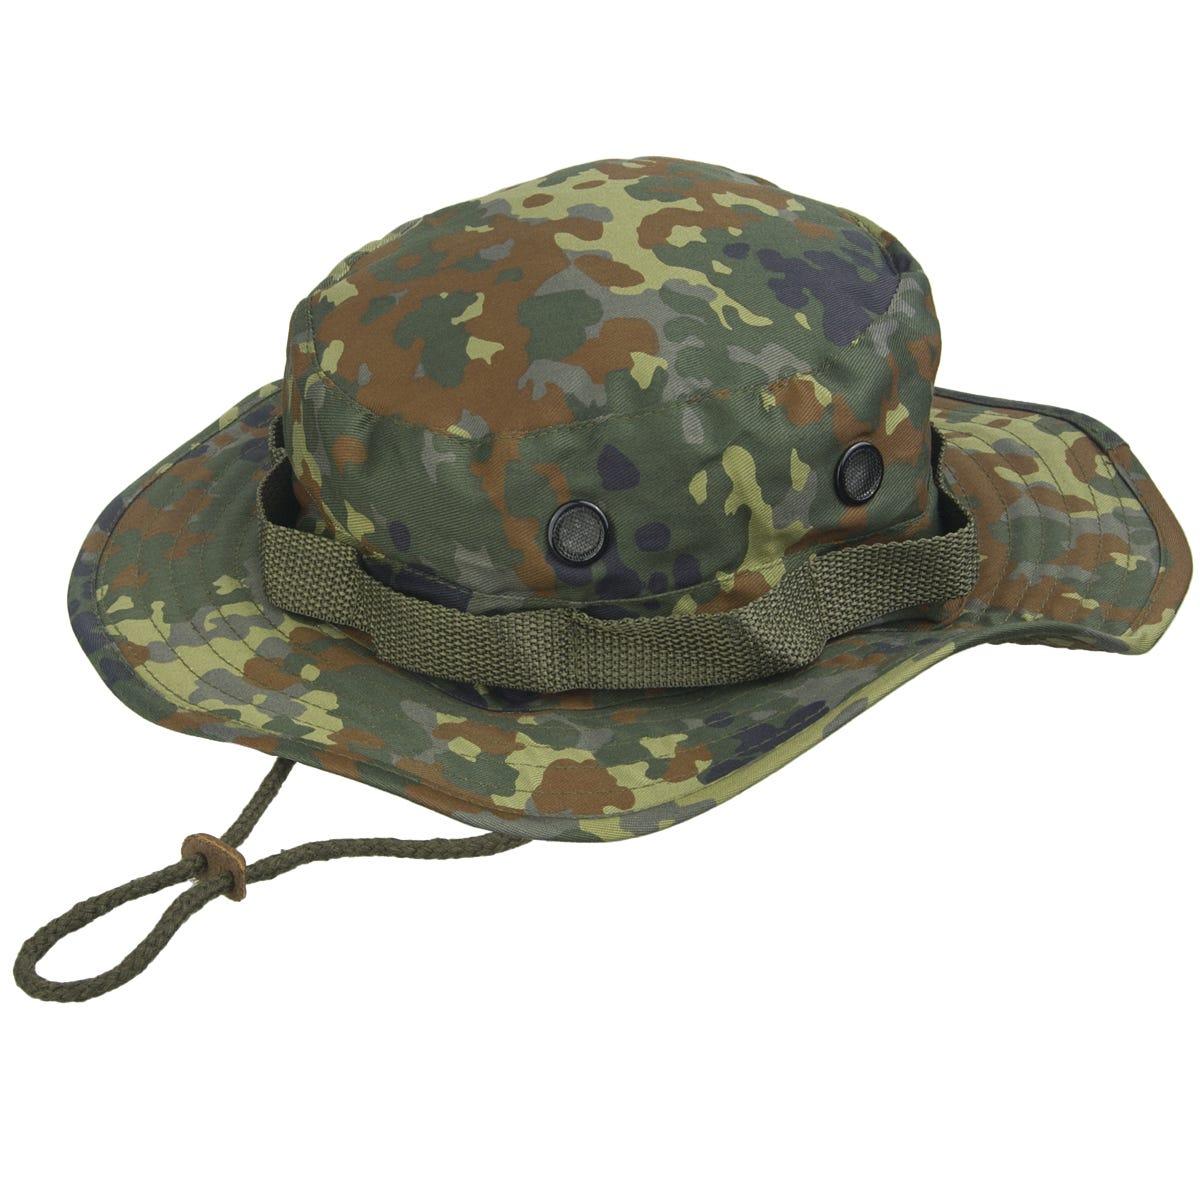 d9cdbc2c98c Mil-Tec GI Boonie Hat Flecktarn